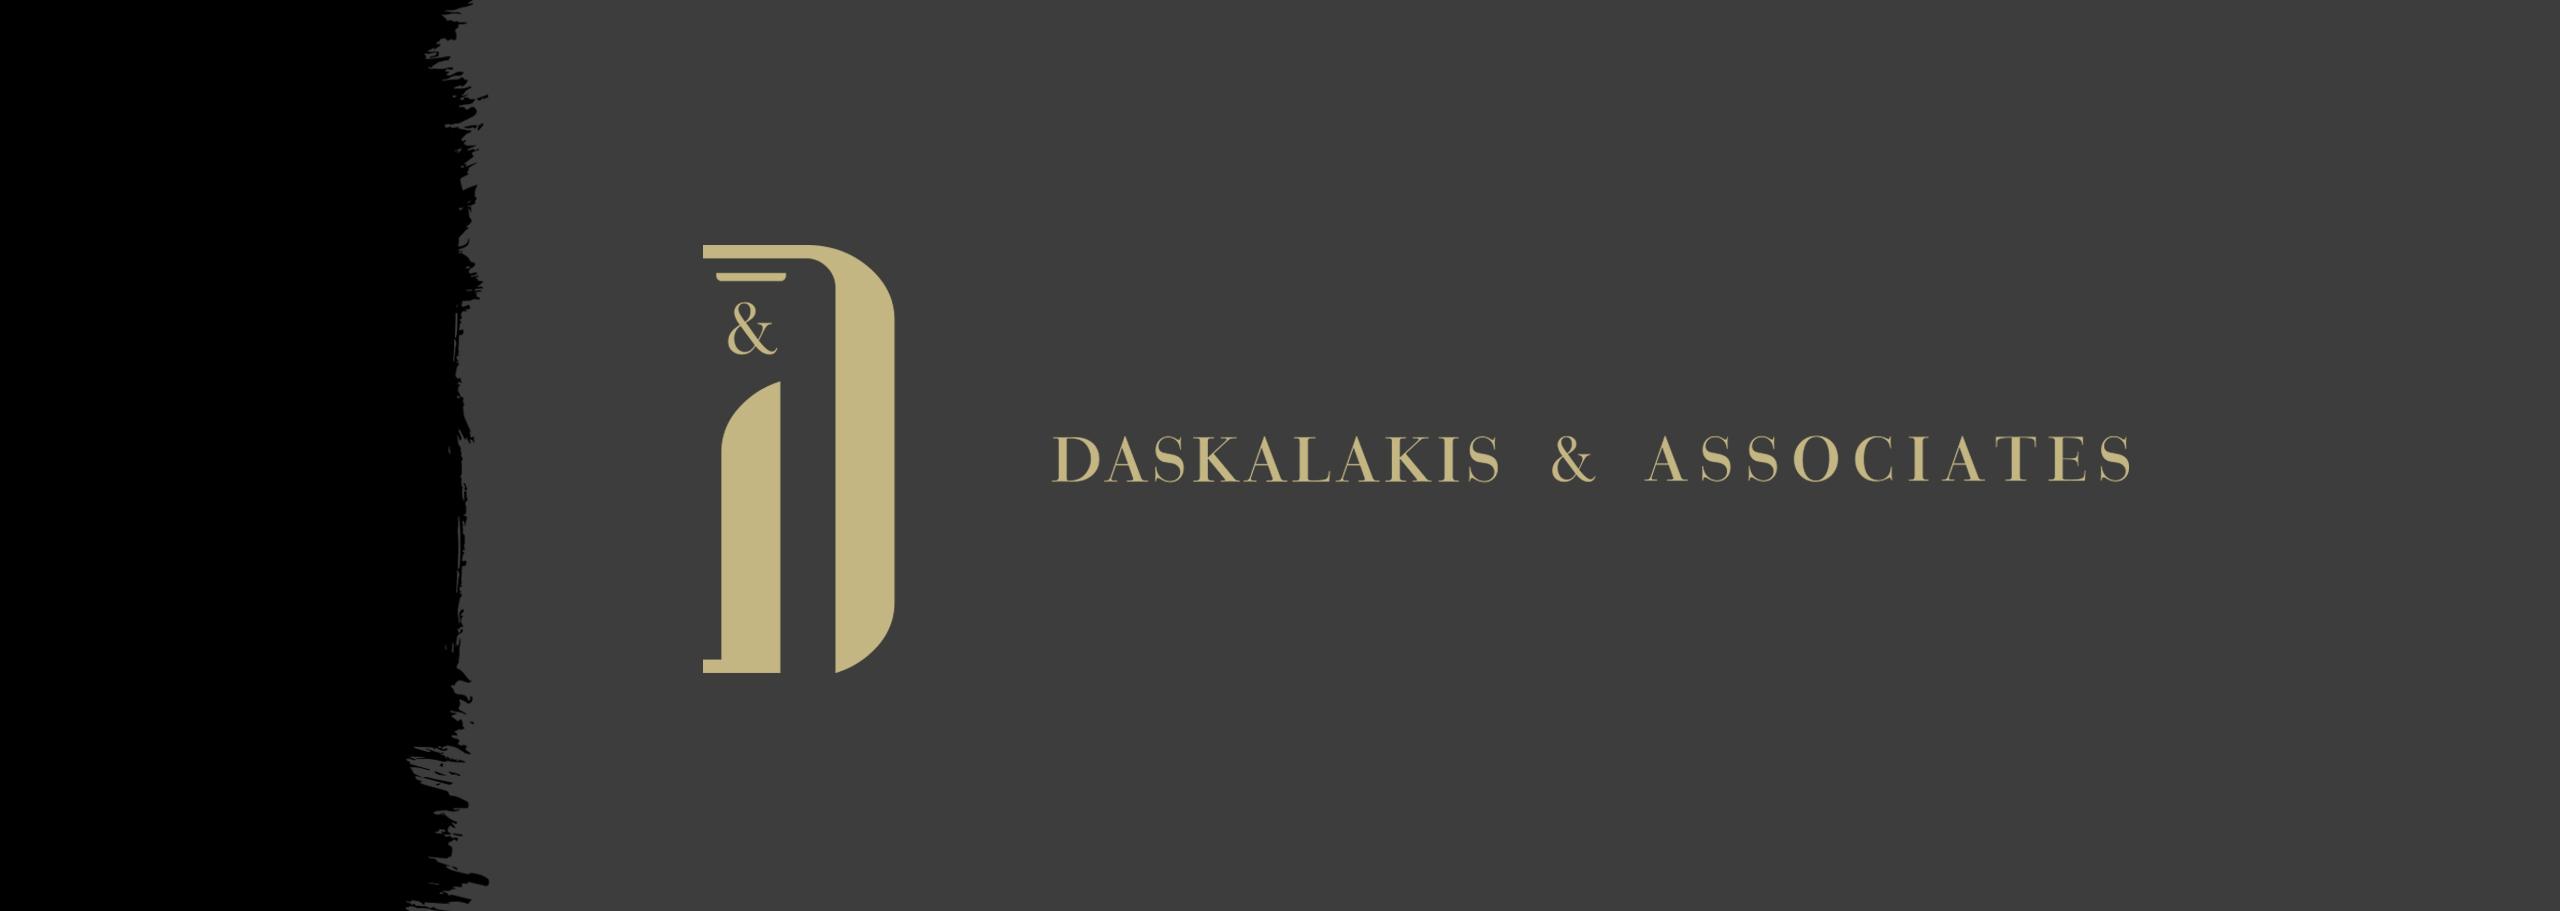 Daskalakis & Associates